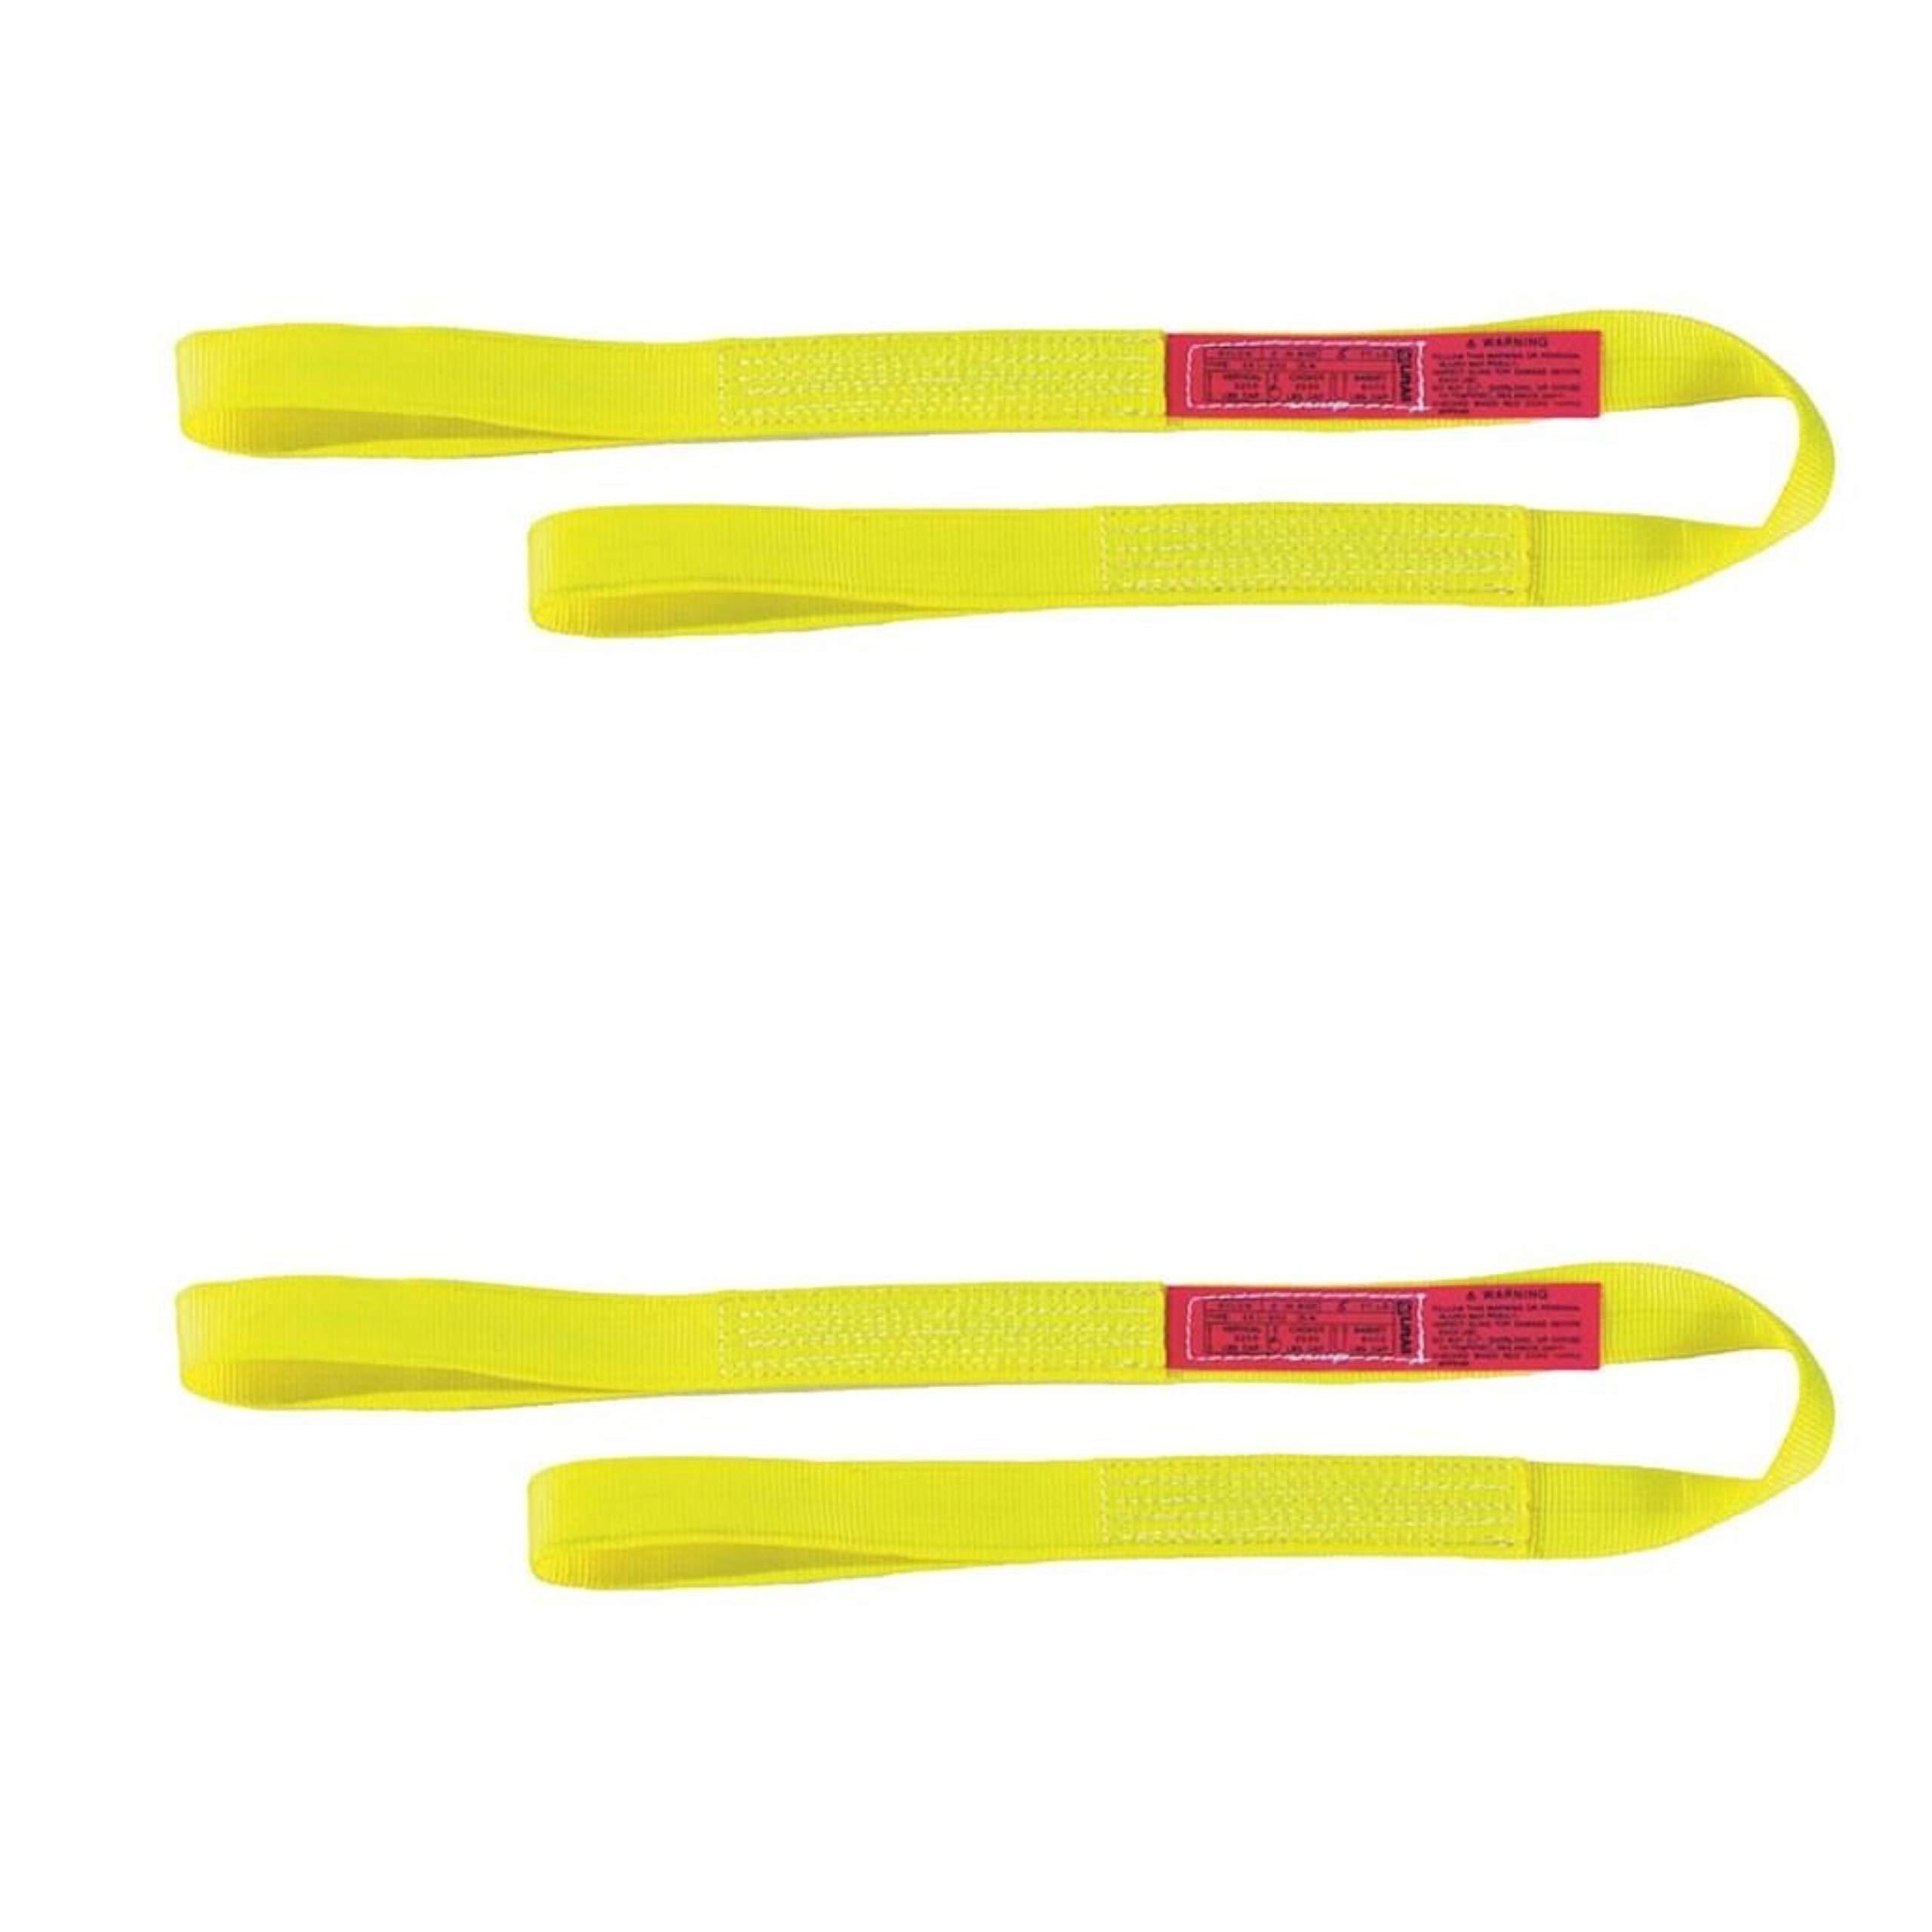 Liftall EE1601NFX3 Eye-Eye Web Sling, Nylon, 1'' x 3', 1-ply, Vertical Capacity- 1200 LBS, Flat-Eye (Two Pack) by Lift-All